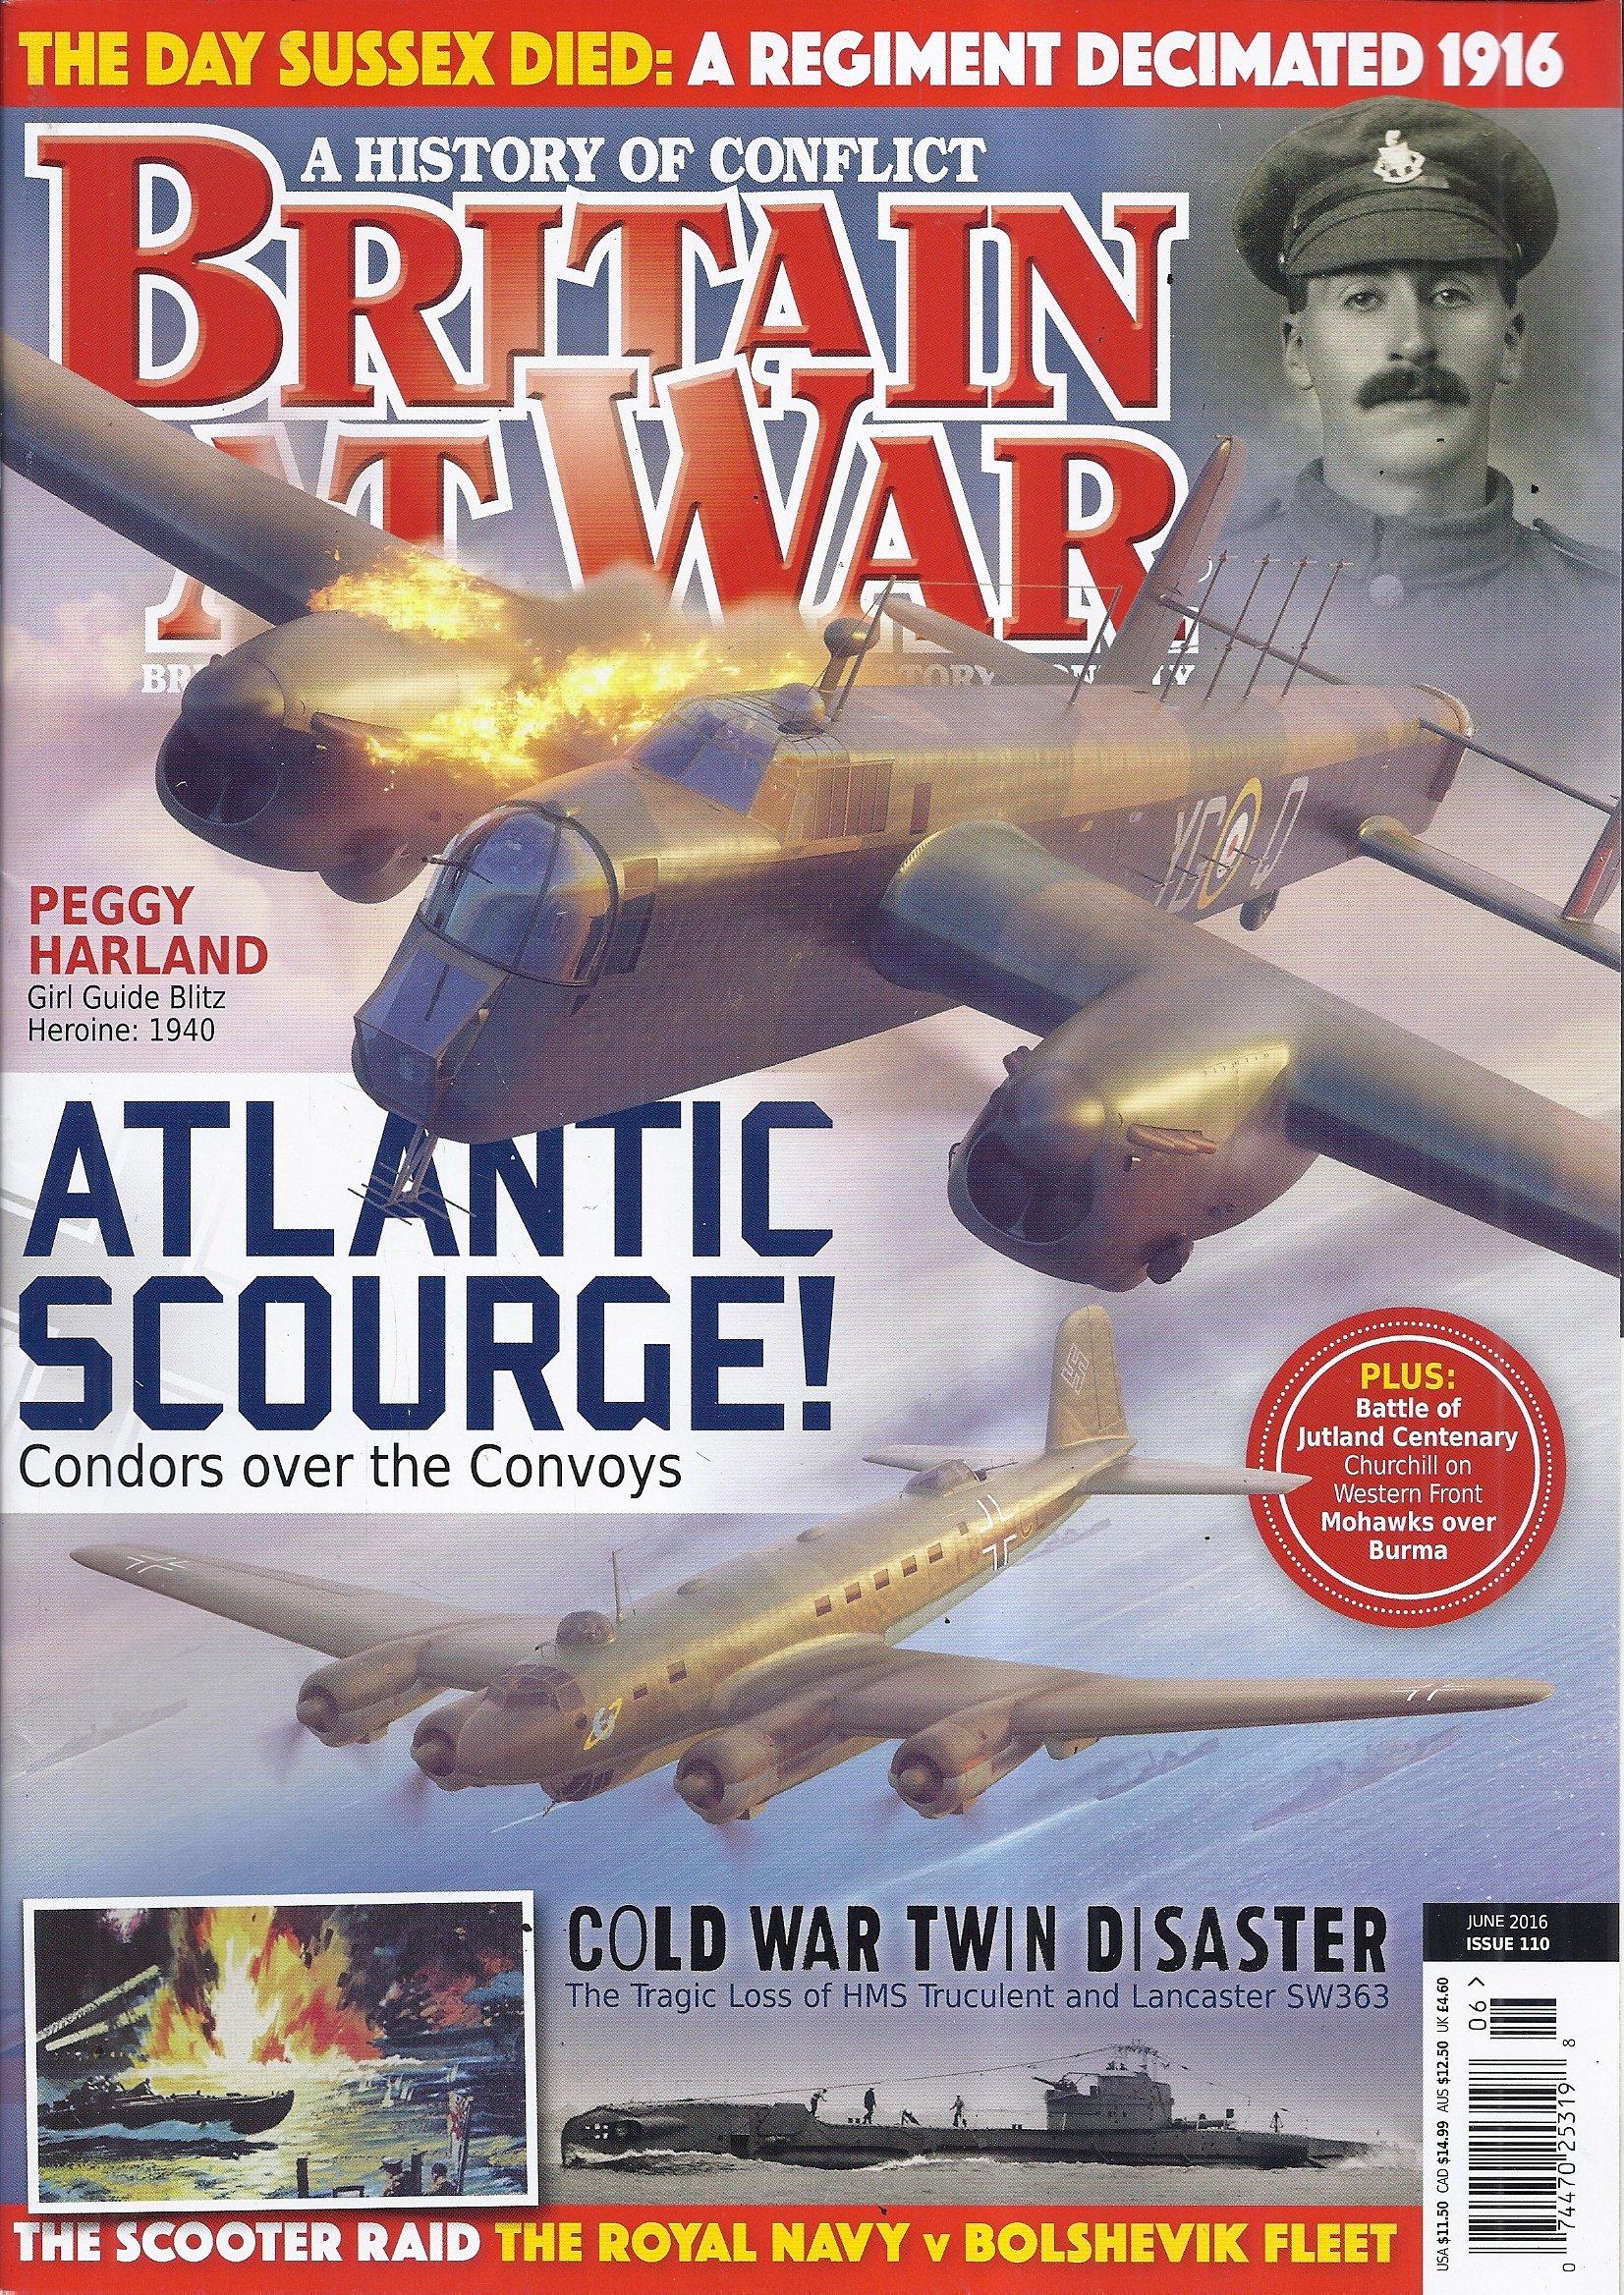 Download Britain At War Magazine (Issue 110 - June 2016 - The Day Sussex Died) ebook